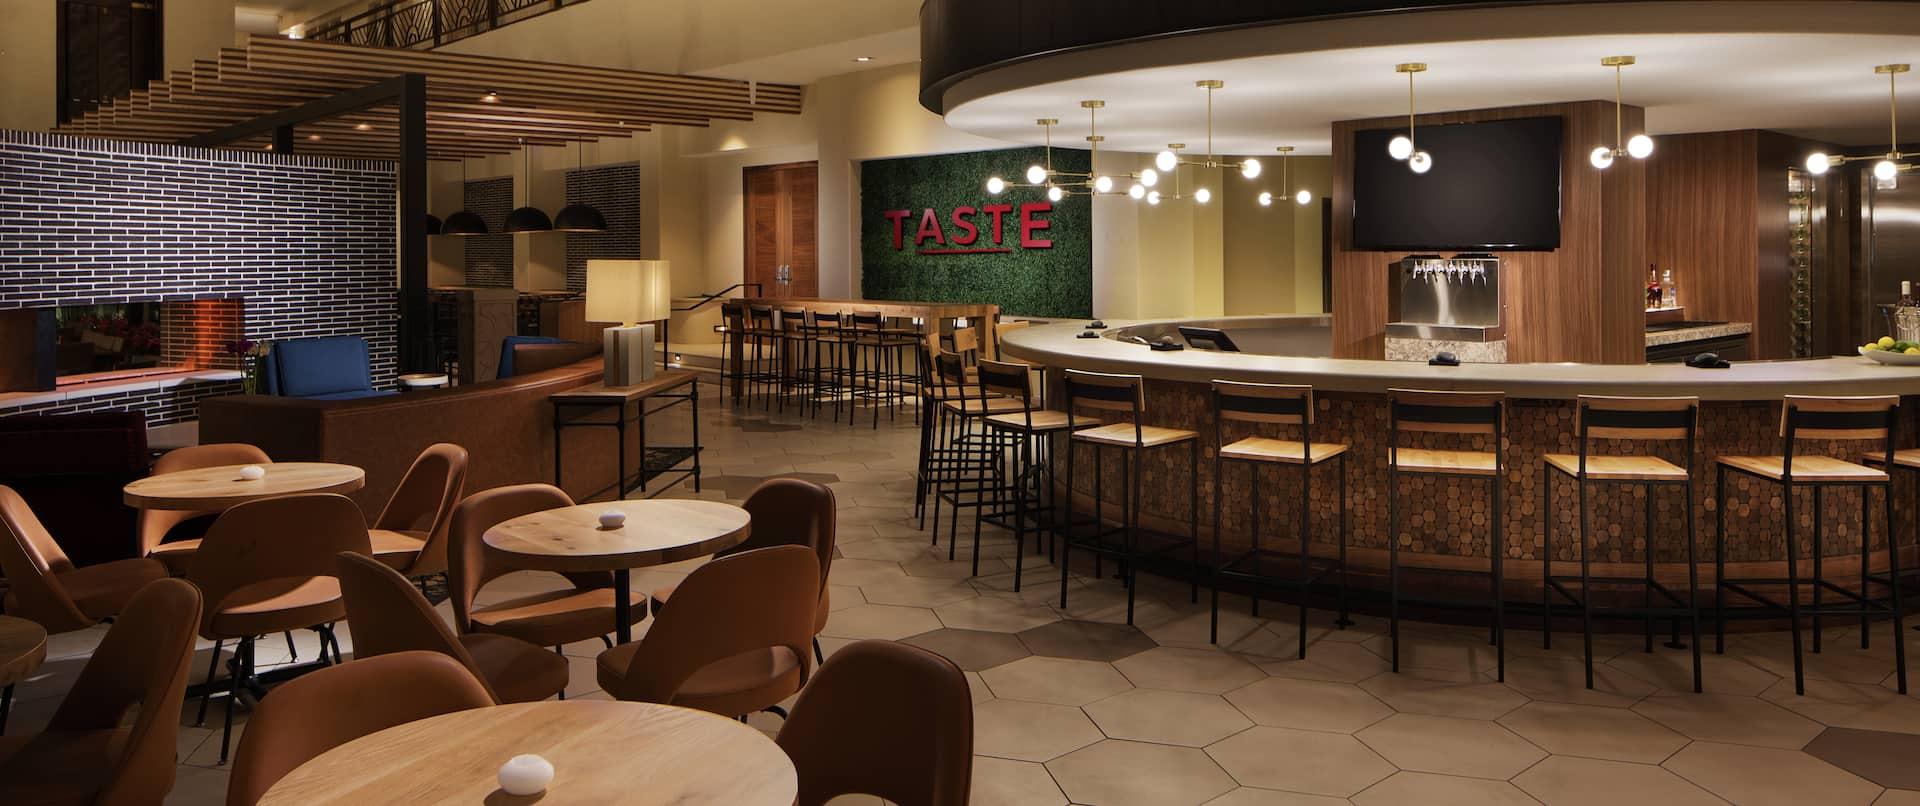 Taste Restaurant Seating Area